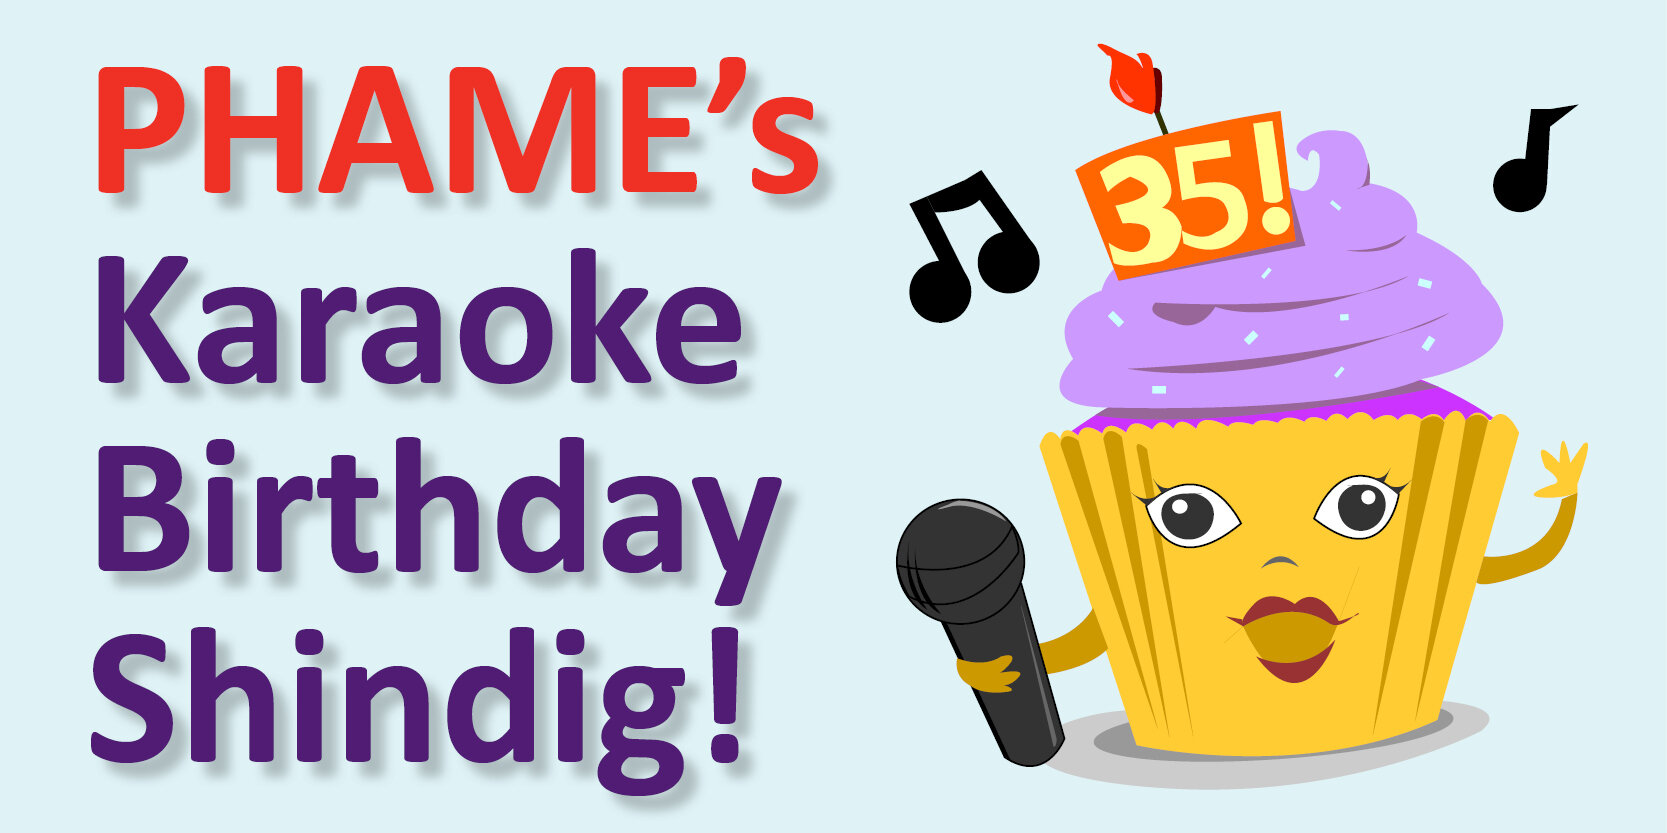 Singing cupcake with the words karaoke birthday shindig